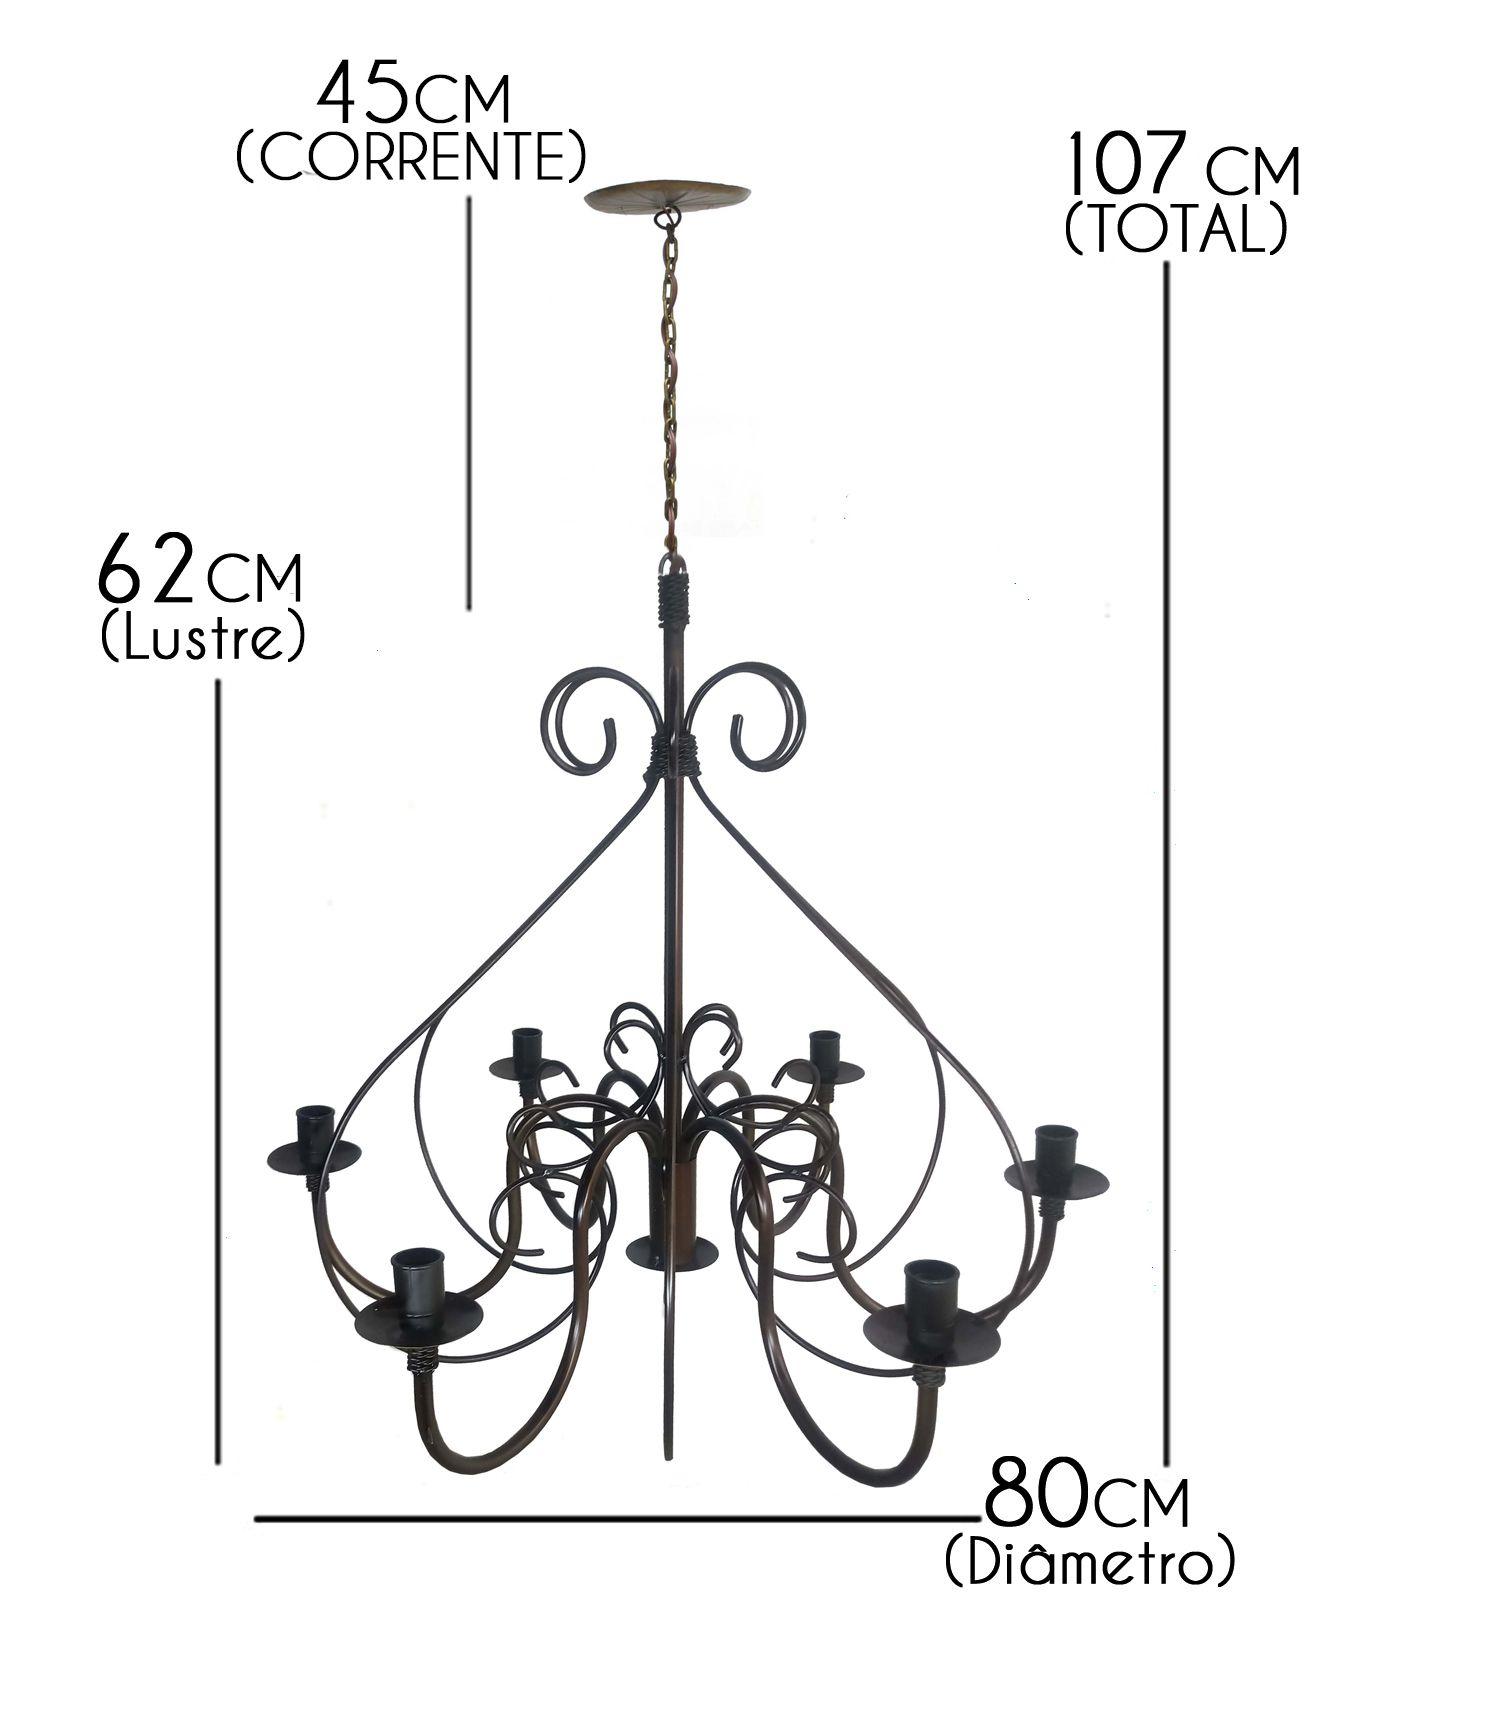 Luminaria Grande Moderna De Ferro Artesanal para Sala De Jantar